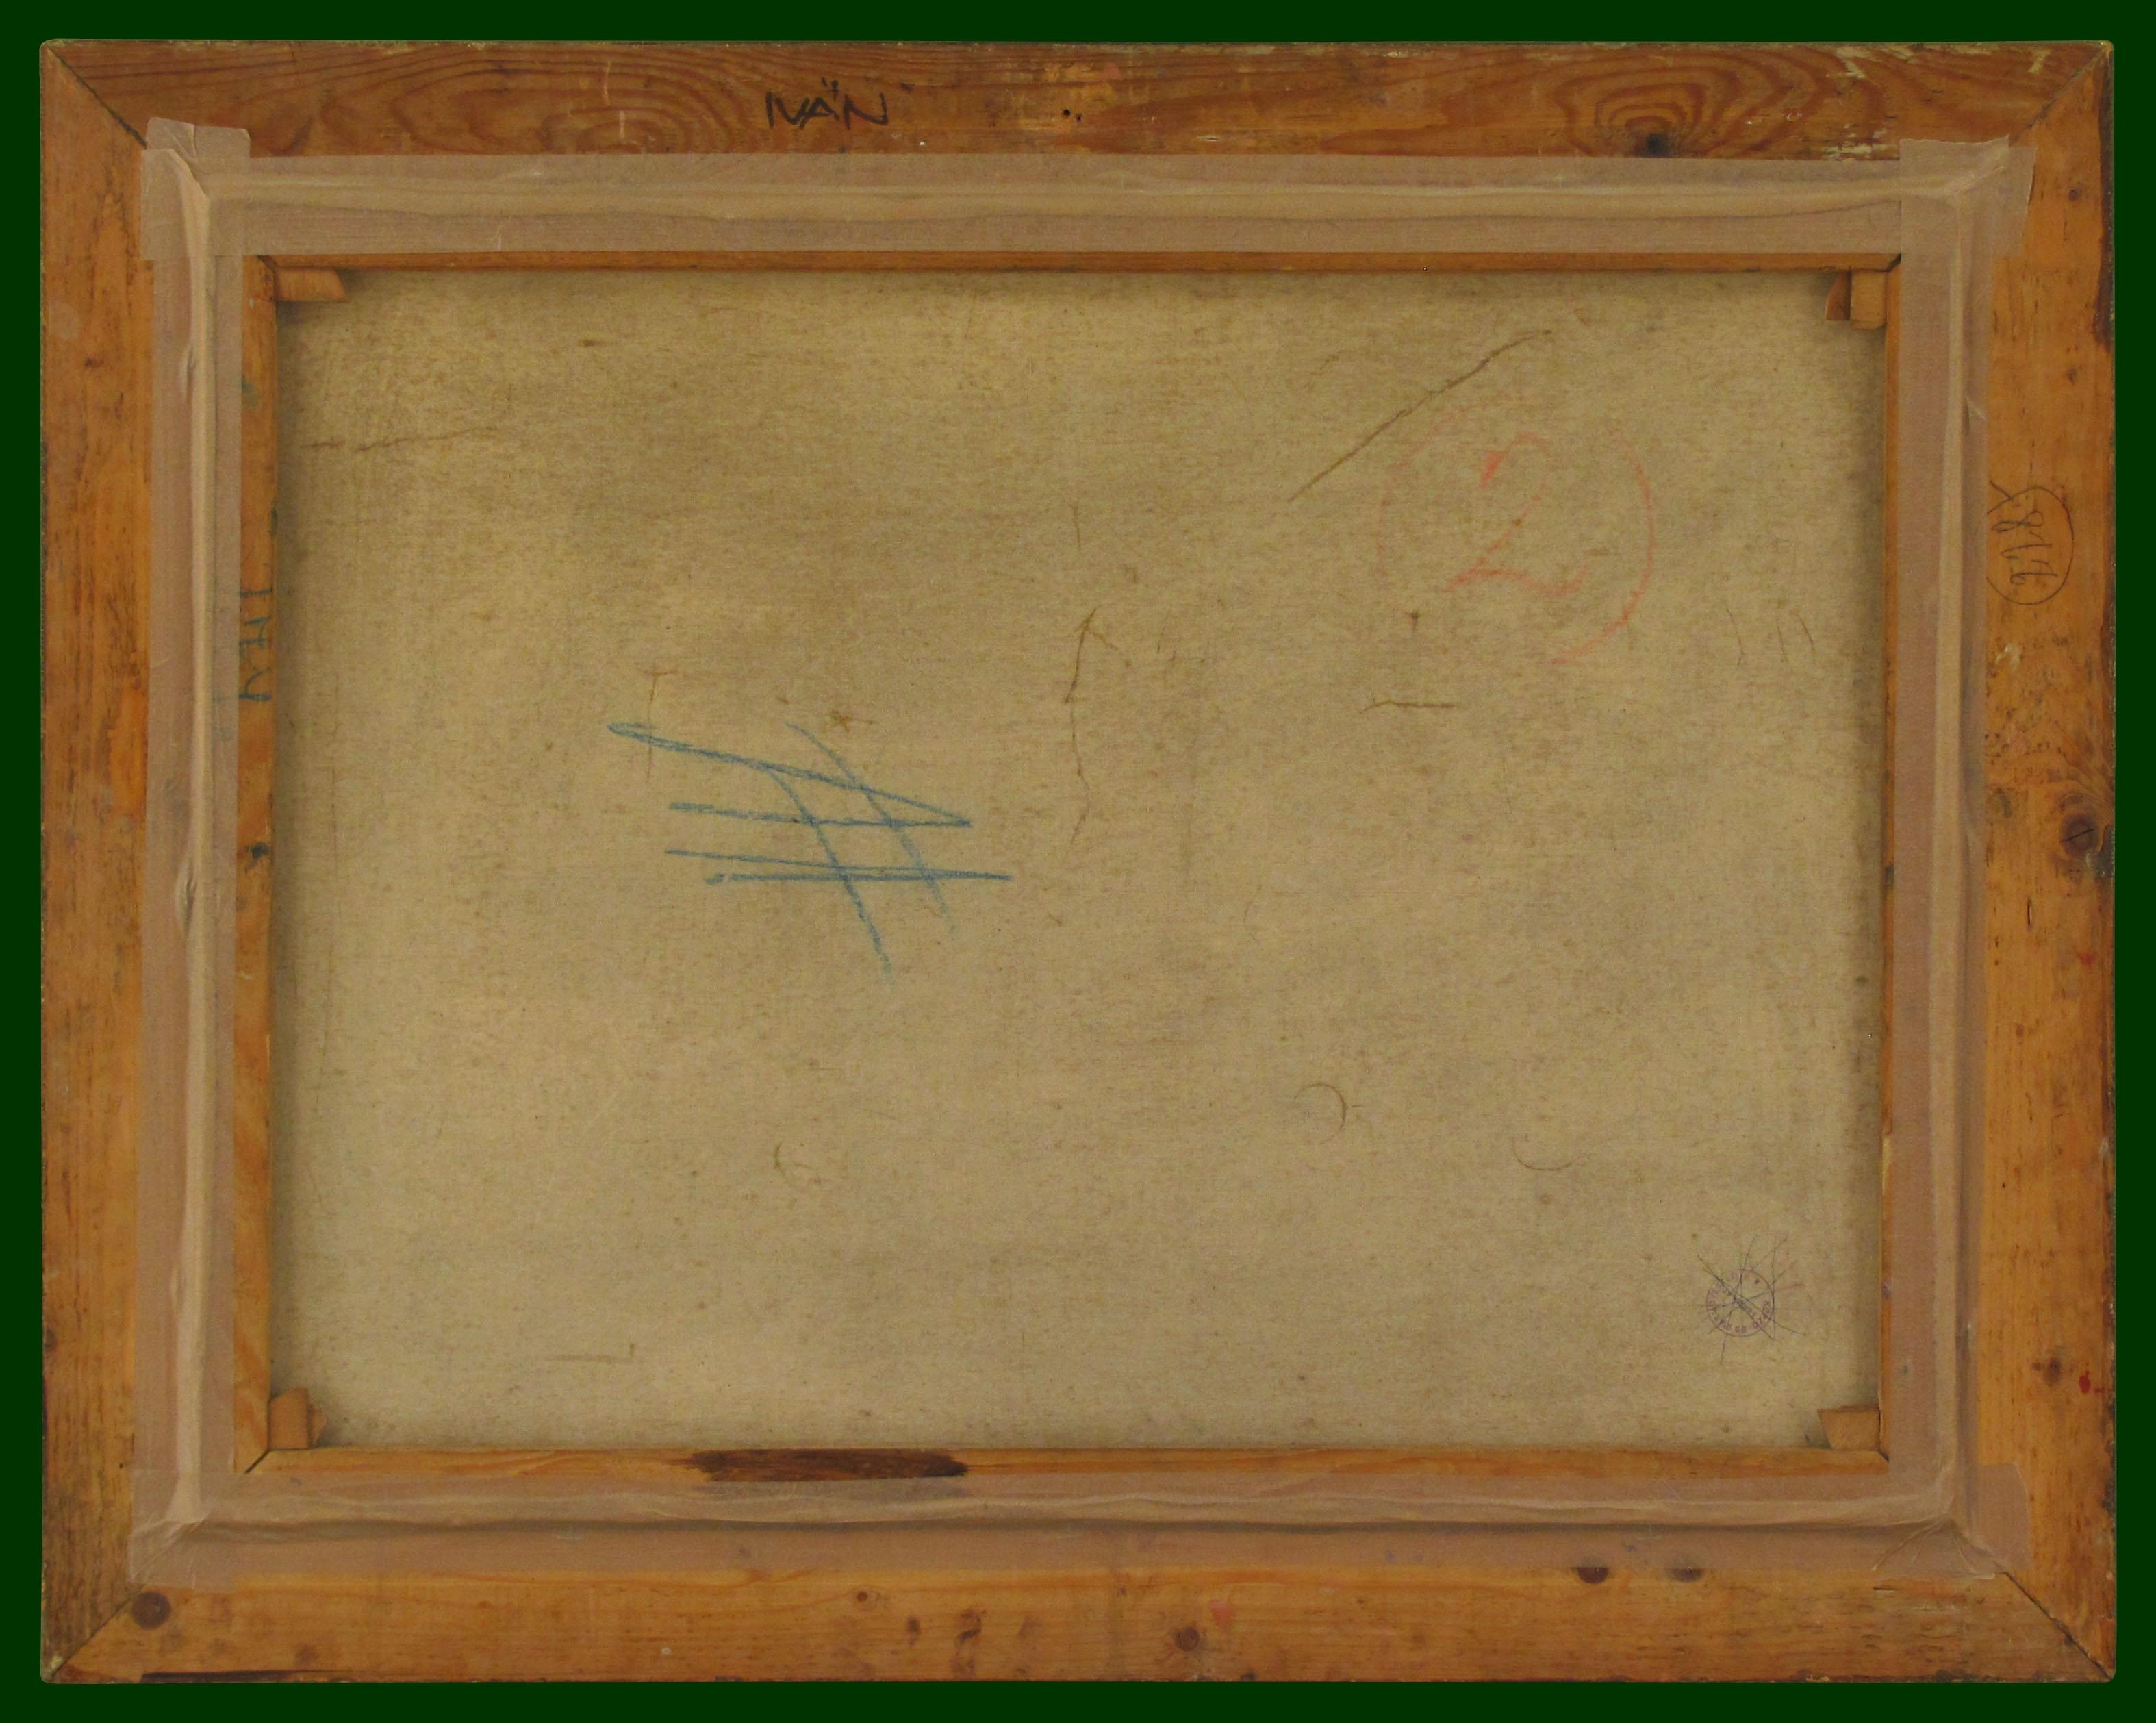 19-9hát.jpg (3149×2516)